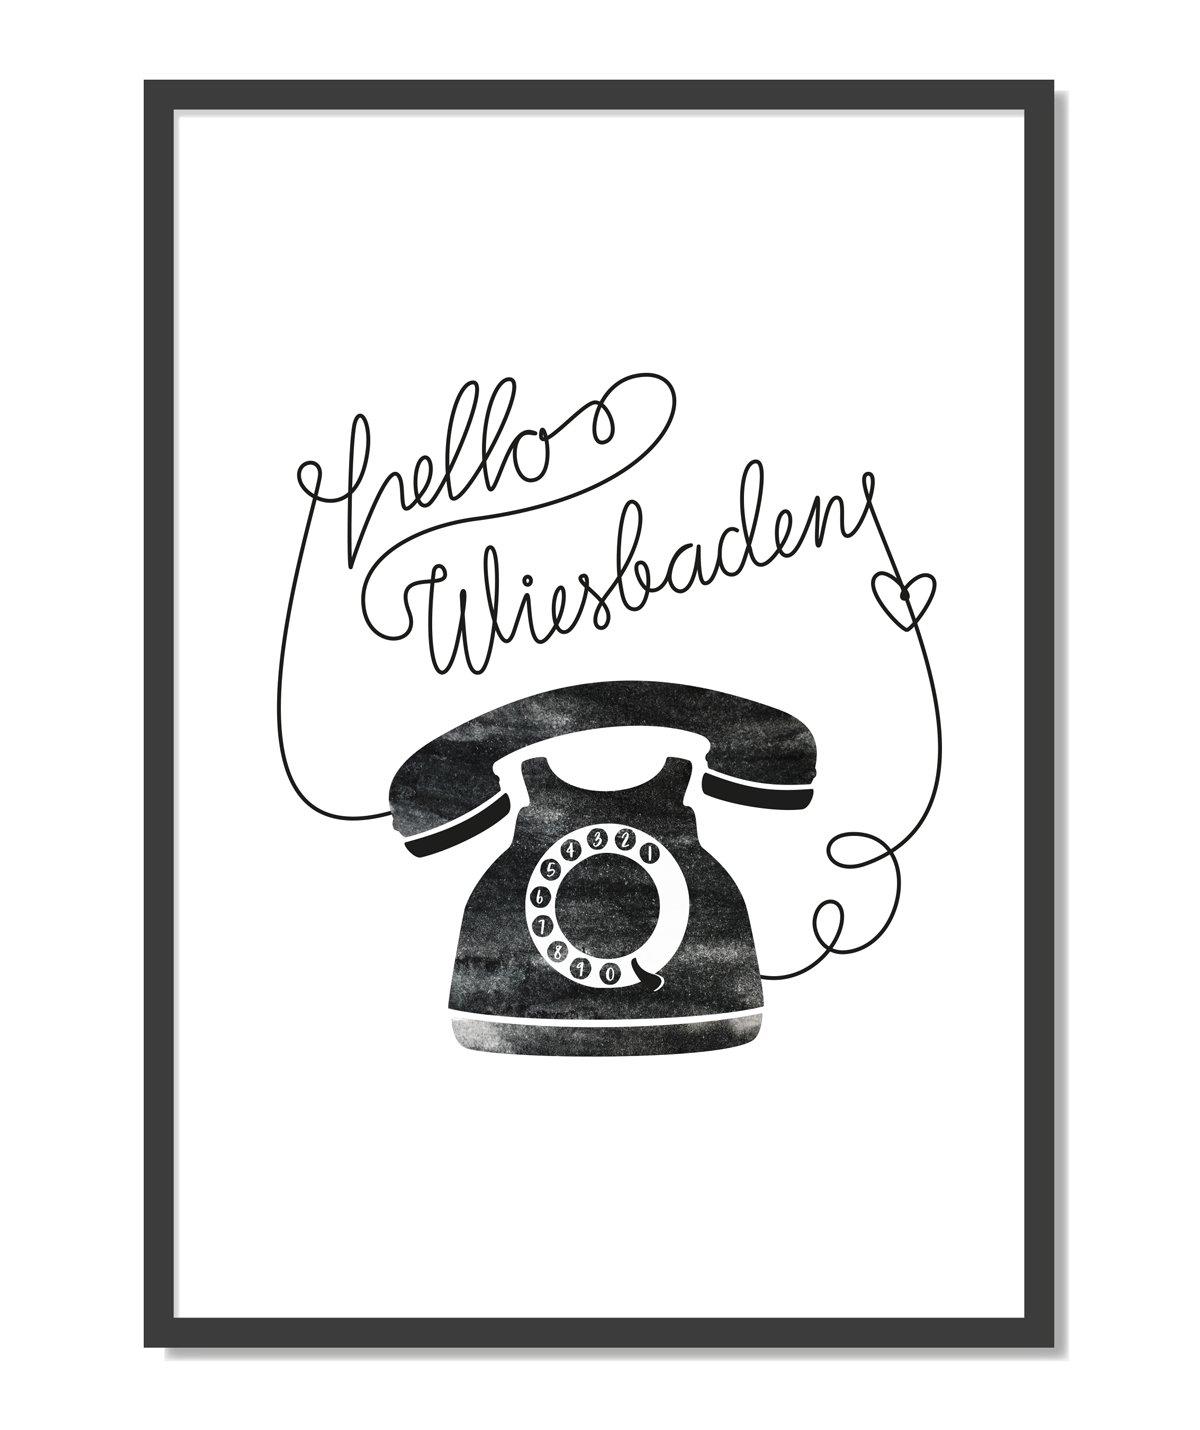 Image of Print: 'Hello World'